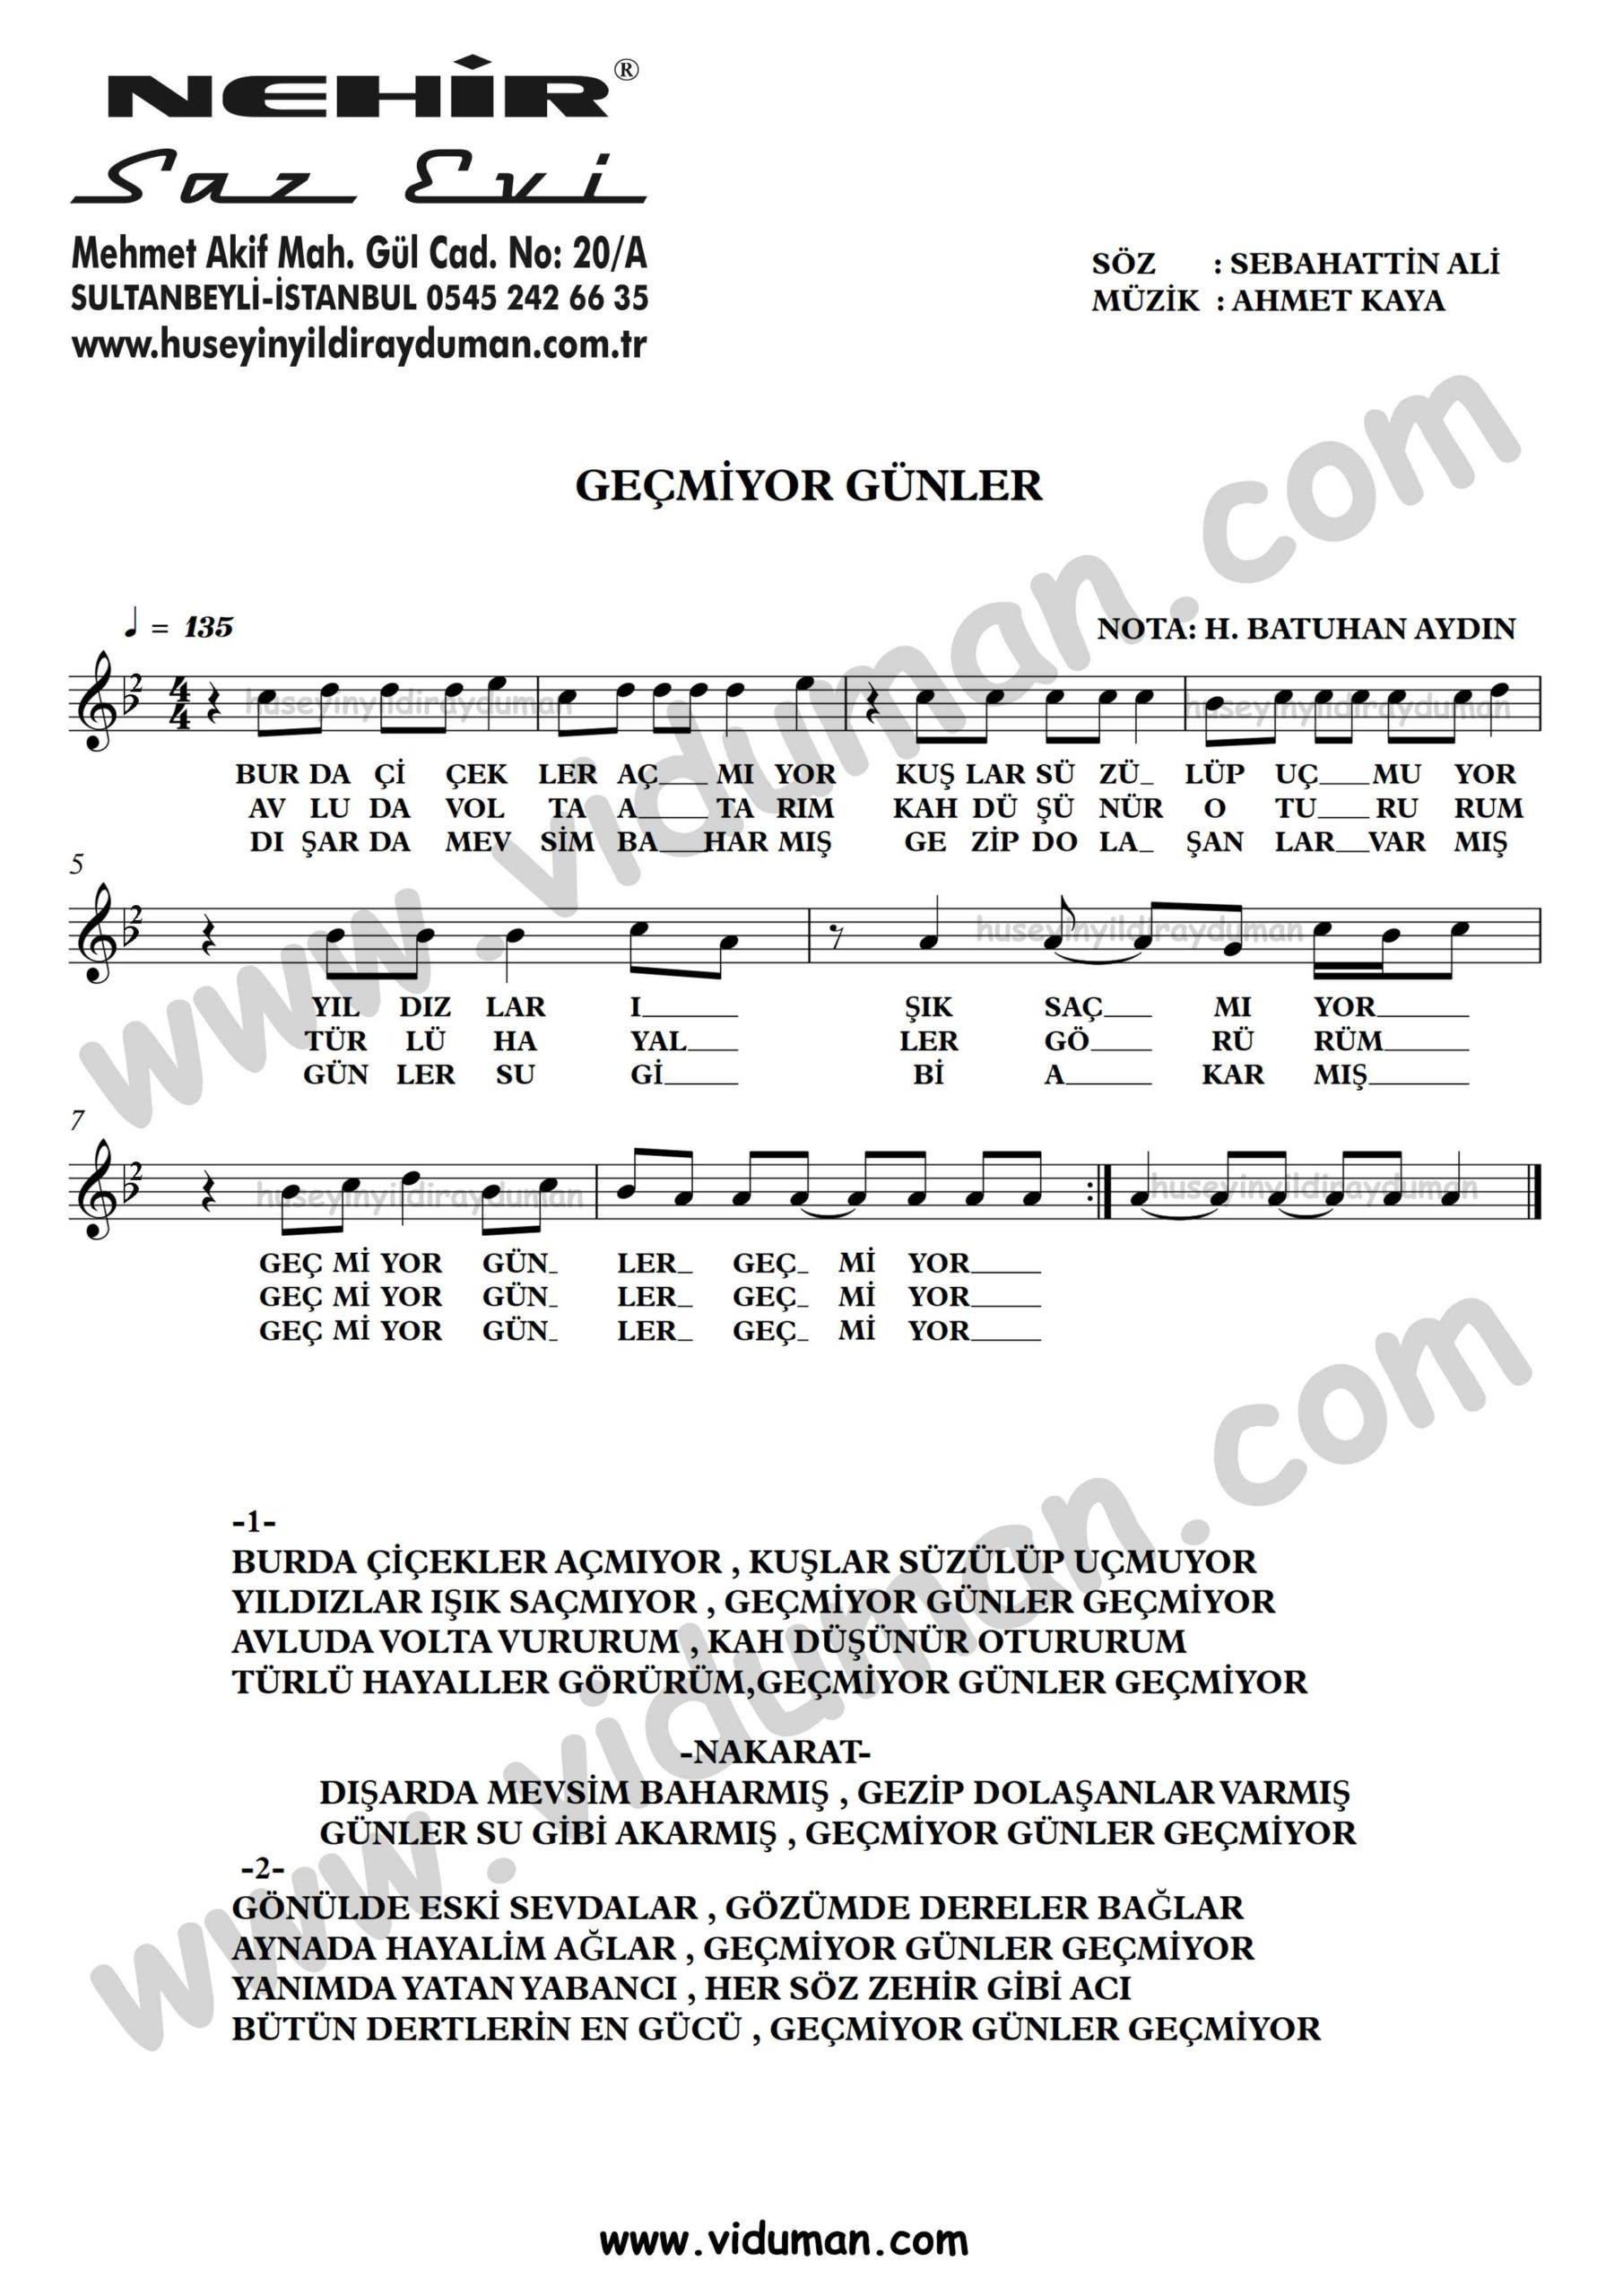 Gecmiyor Gunler-Ahmet Kaya-Baglama-Saz-Turku-Notalari